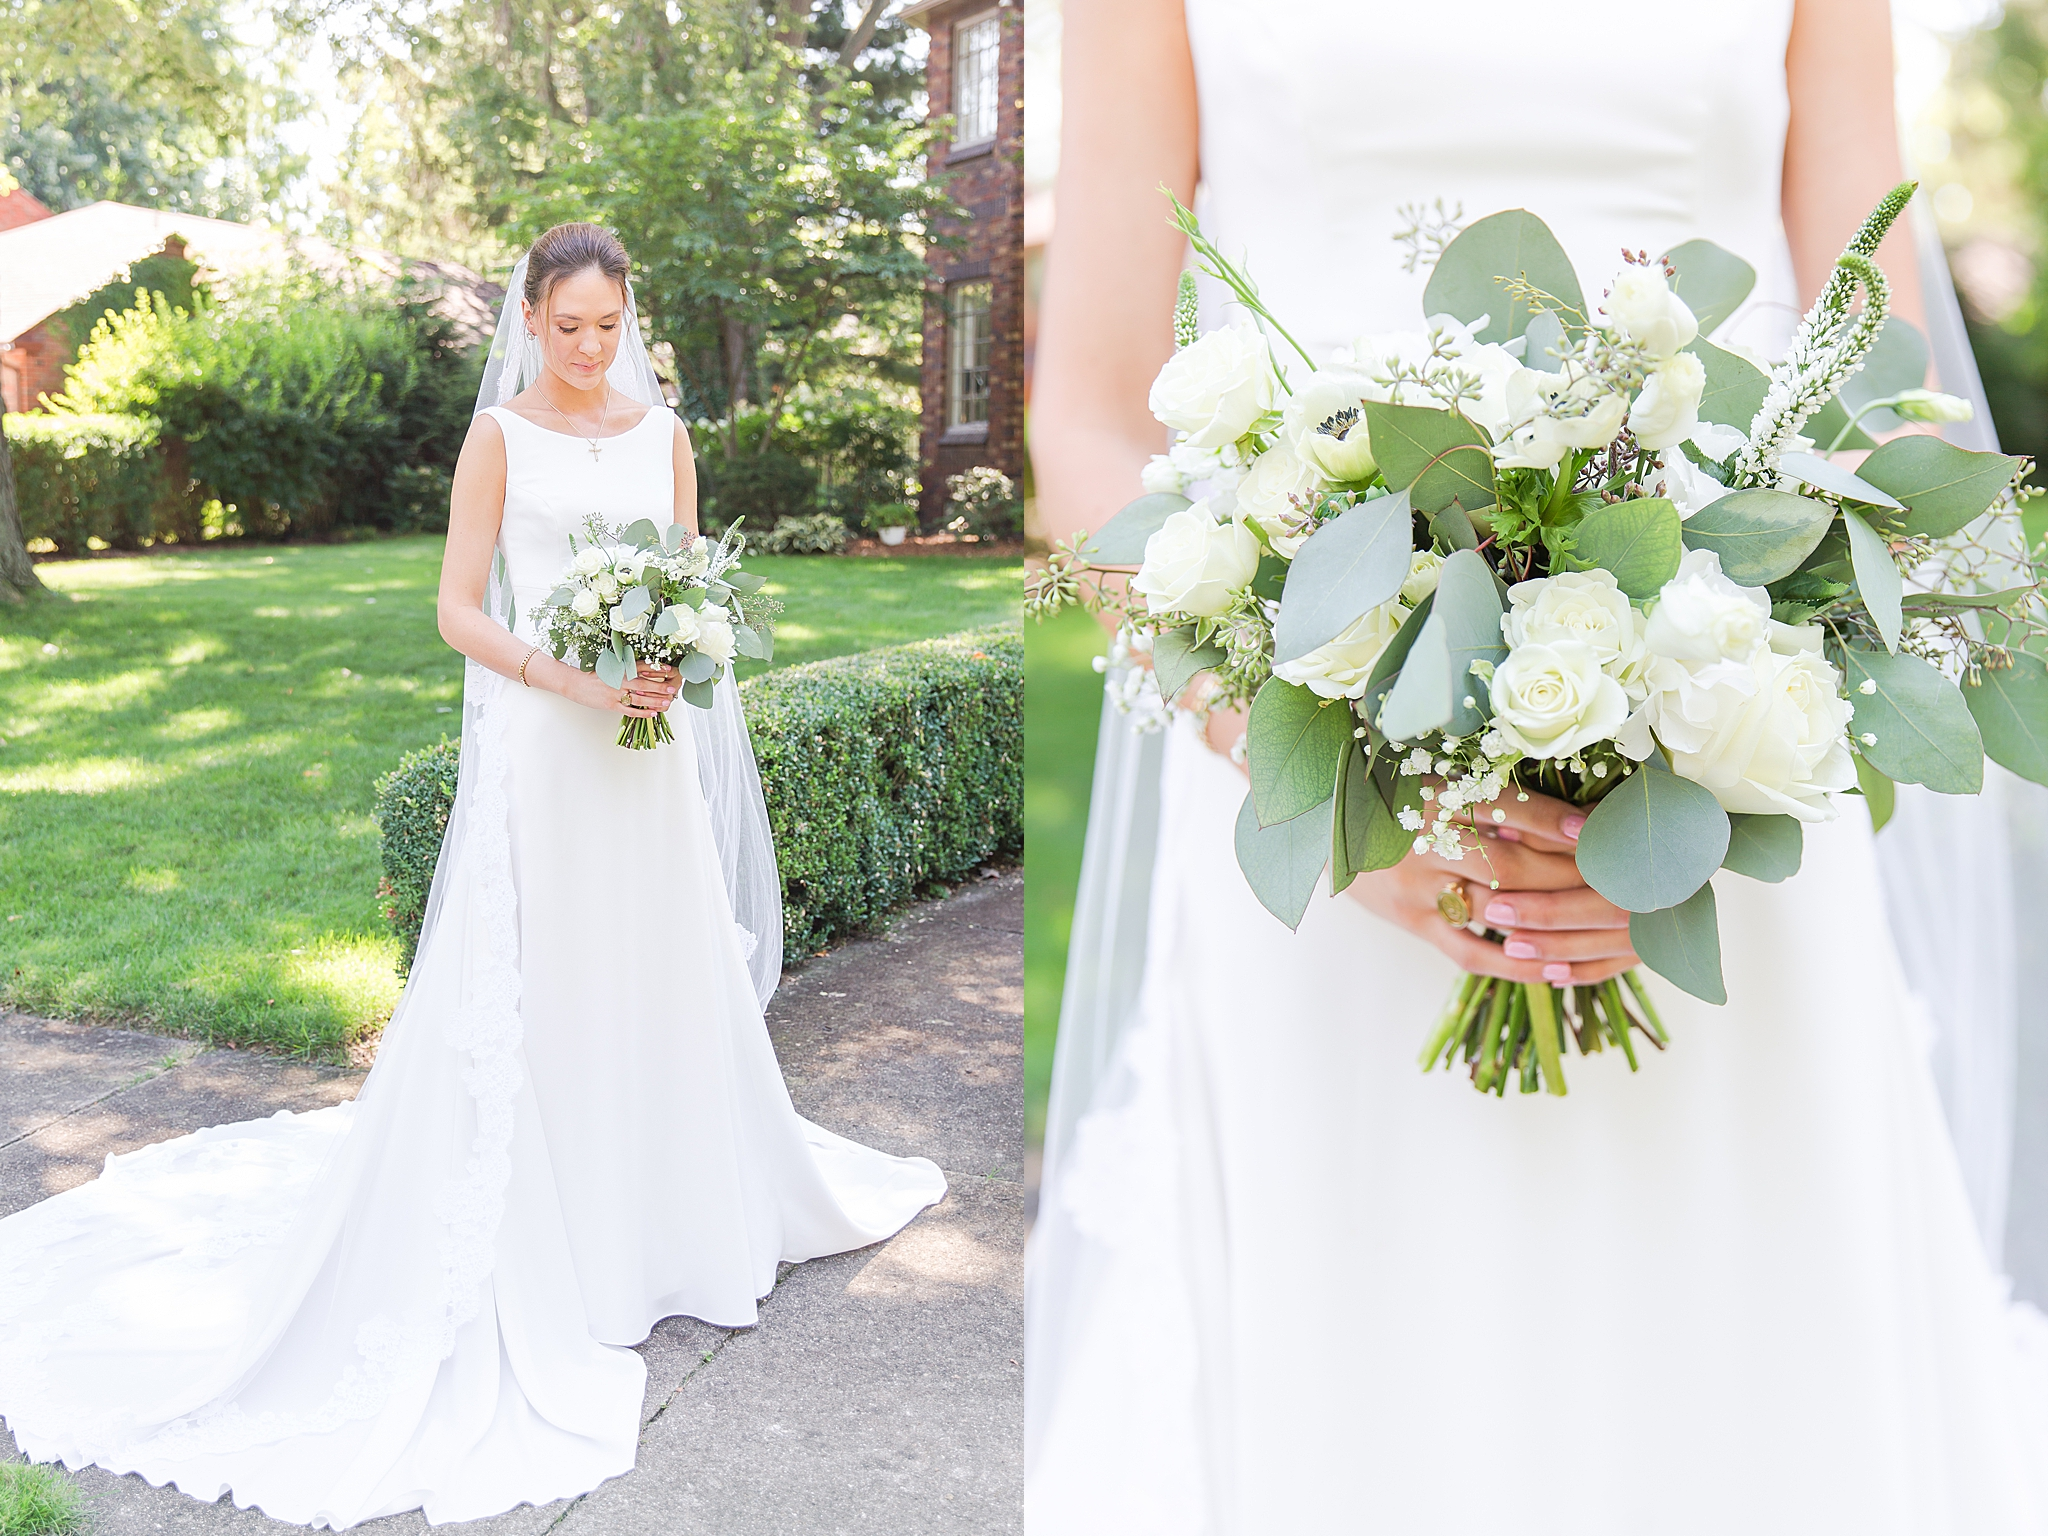 detroit-wedding-photographer-grosse-pointe-academy-chapel-detroit-golf-club-wedding-carly-matt-by-courtney-carolyn-photography_0019.jpg